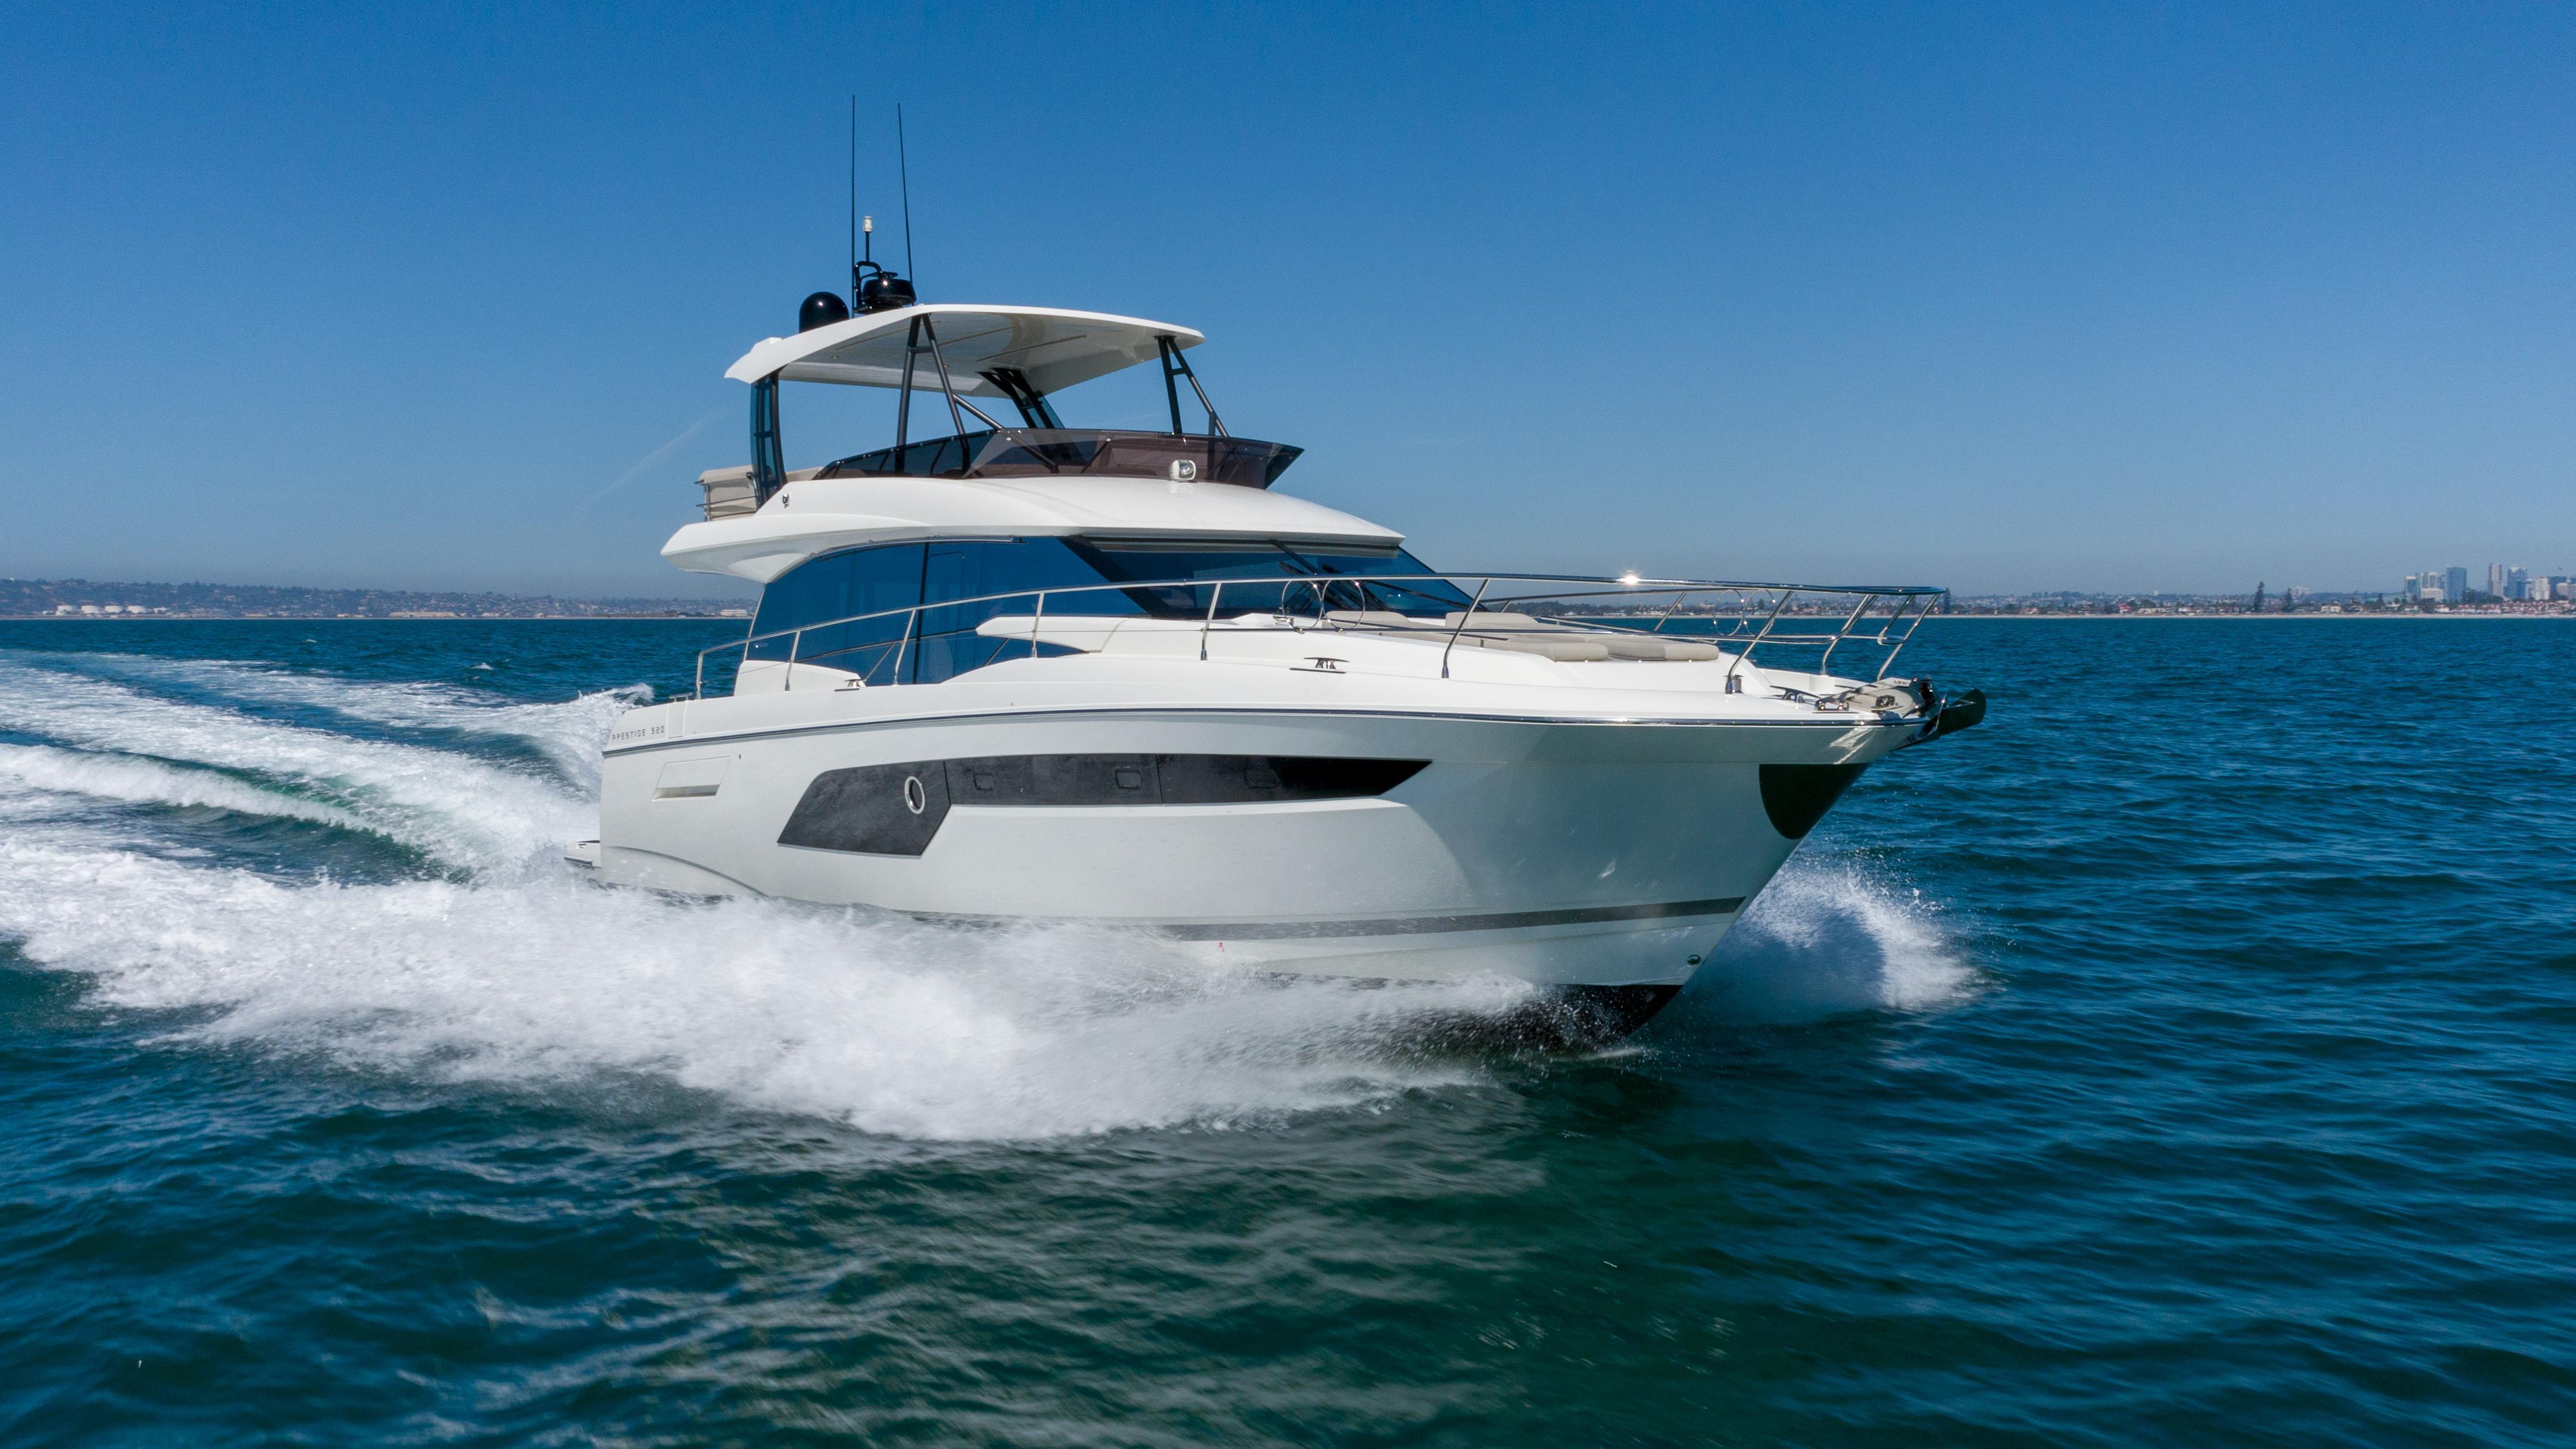 2020 Prestige 520 Fly w/ Seakeeper